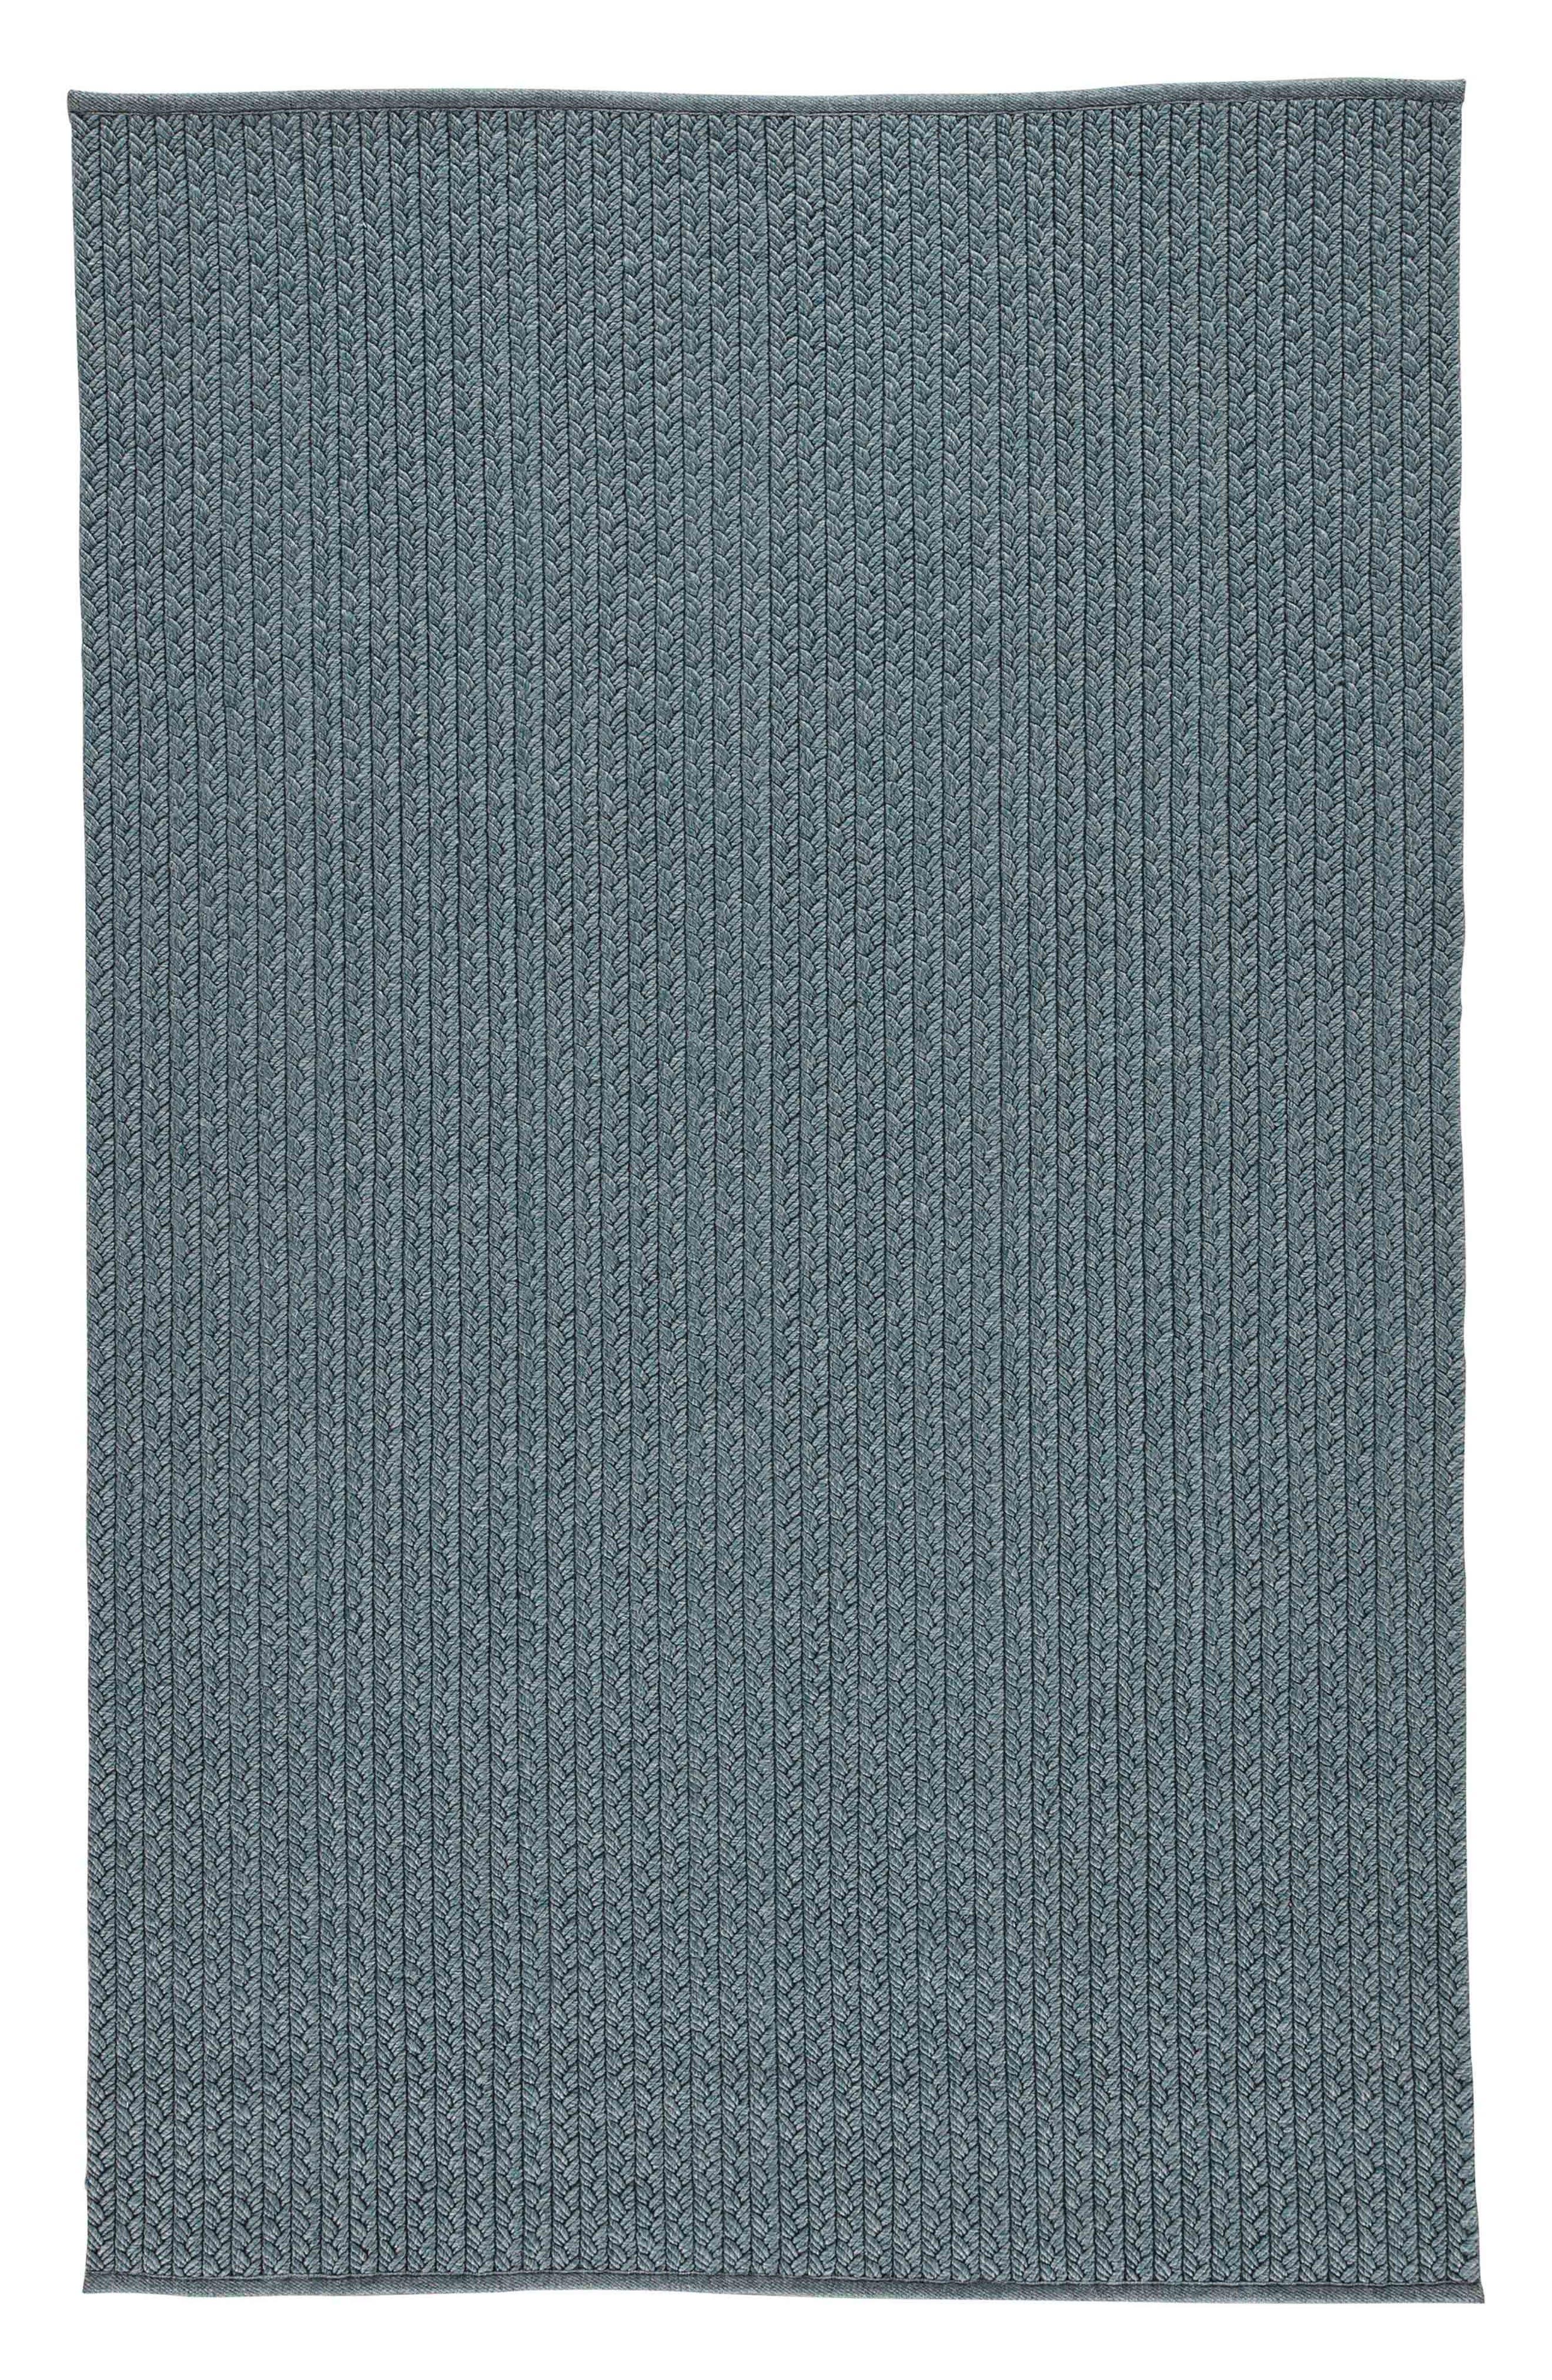 JAIPUR Sedona Area Rug, Main, color, DARK GRAY